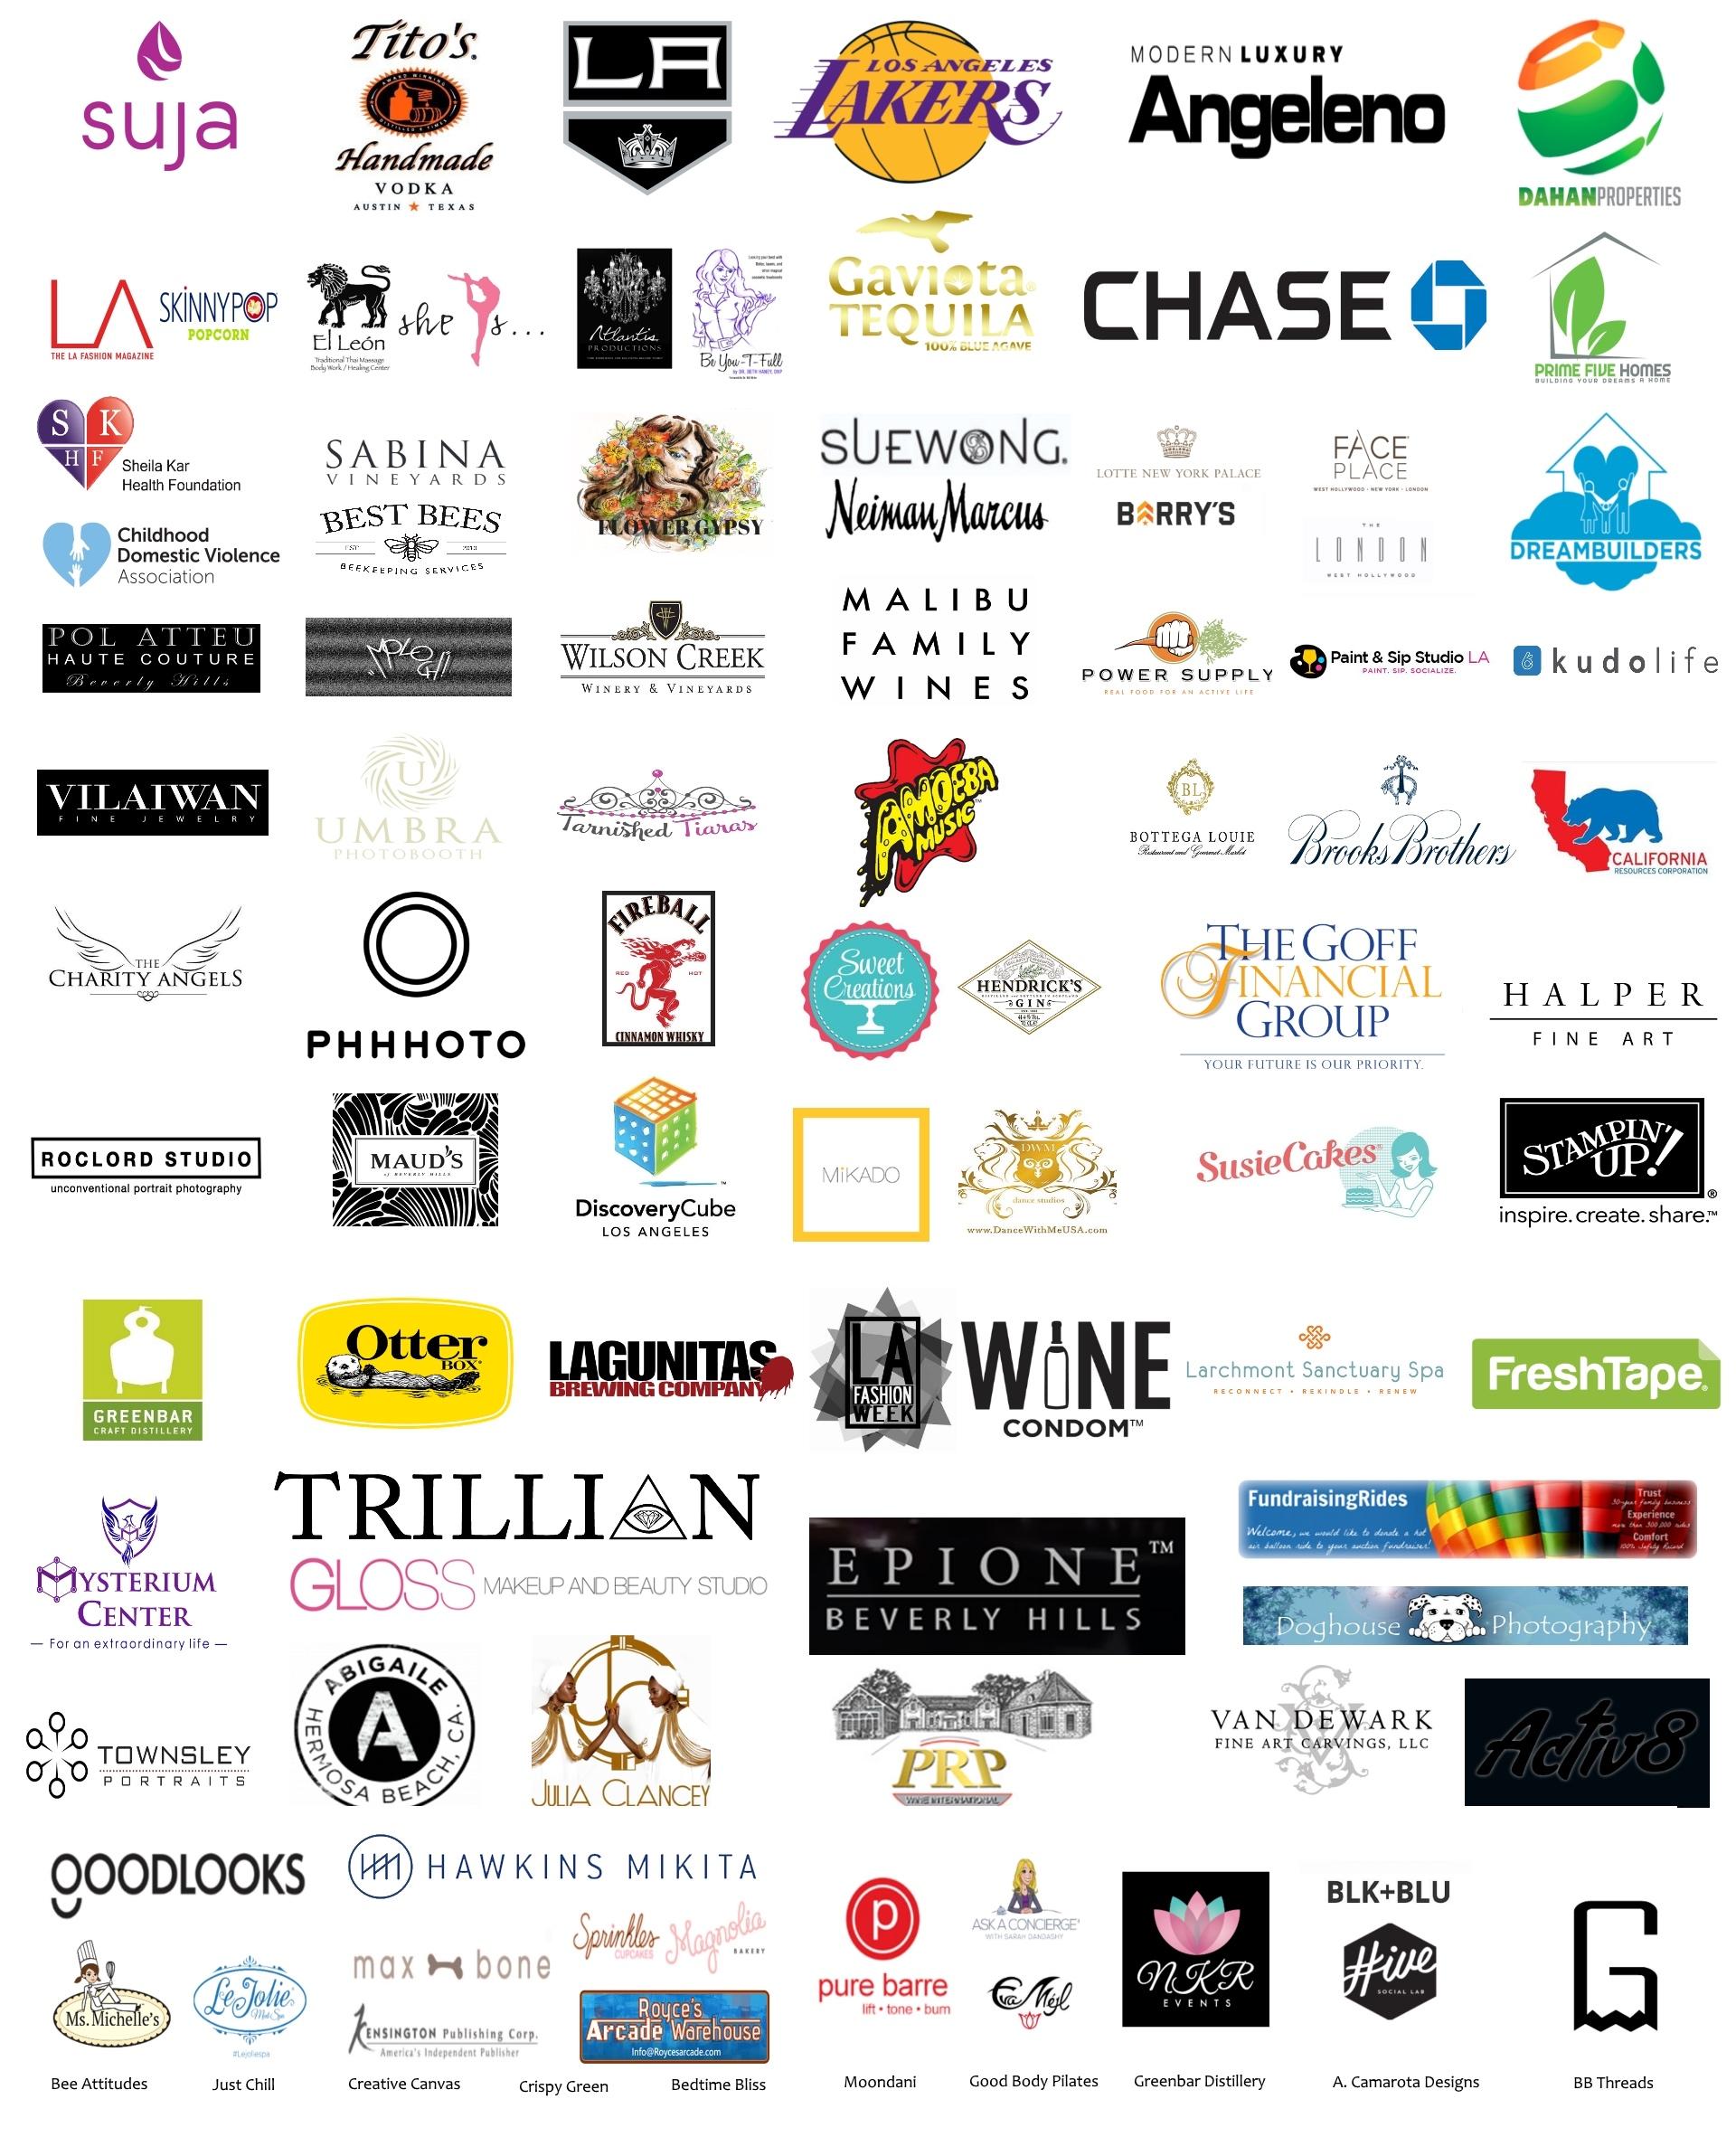 logos-banner_3-3-2016_all-logos-12.jpg